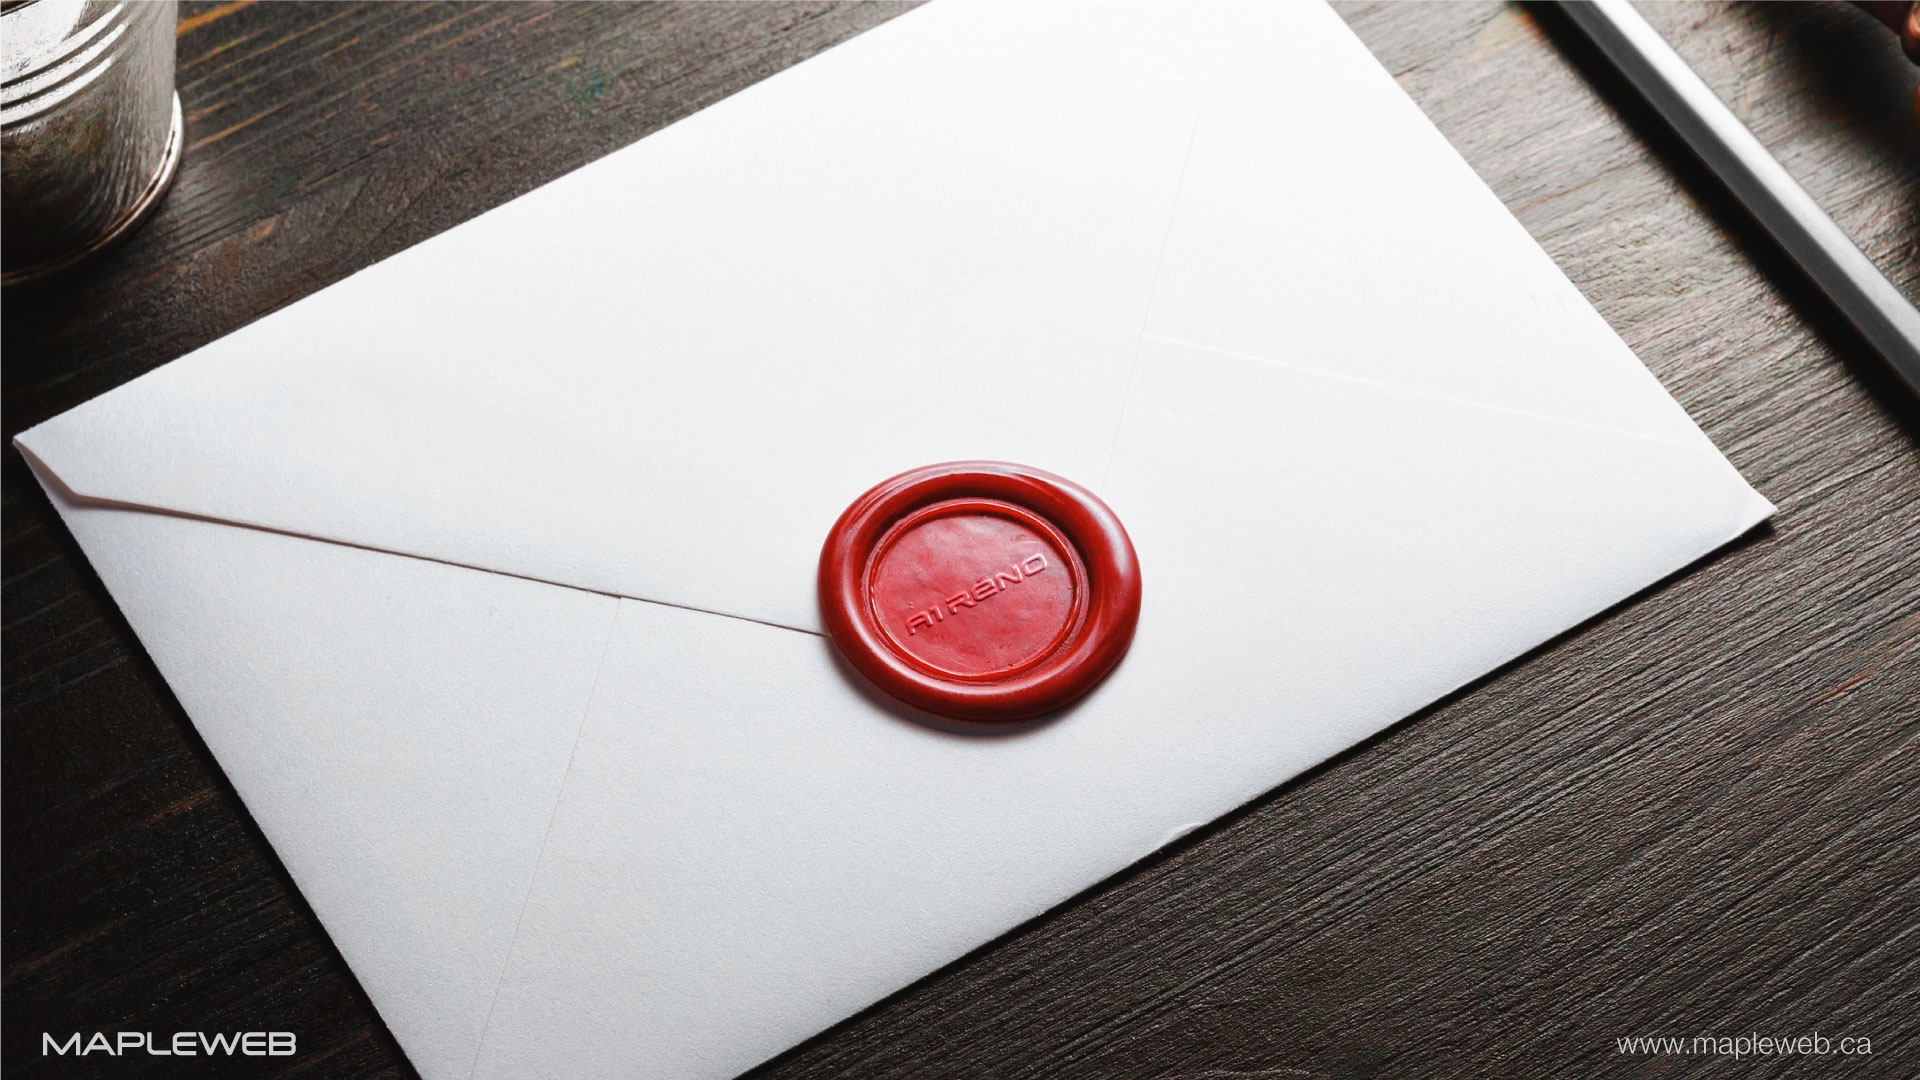 a1-reno-brand-logo-design-by-mapleweb-vancouver-canada-logo-gum-stamp-mock